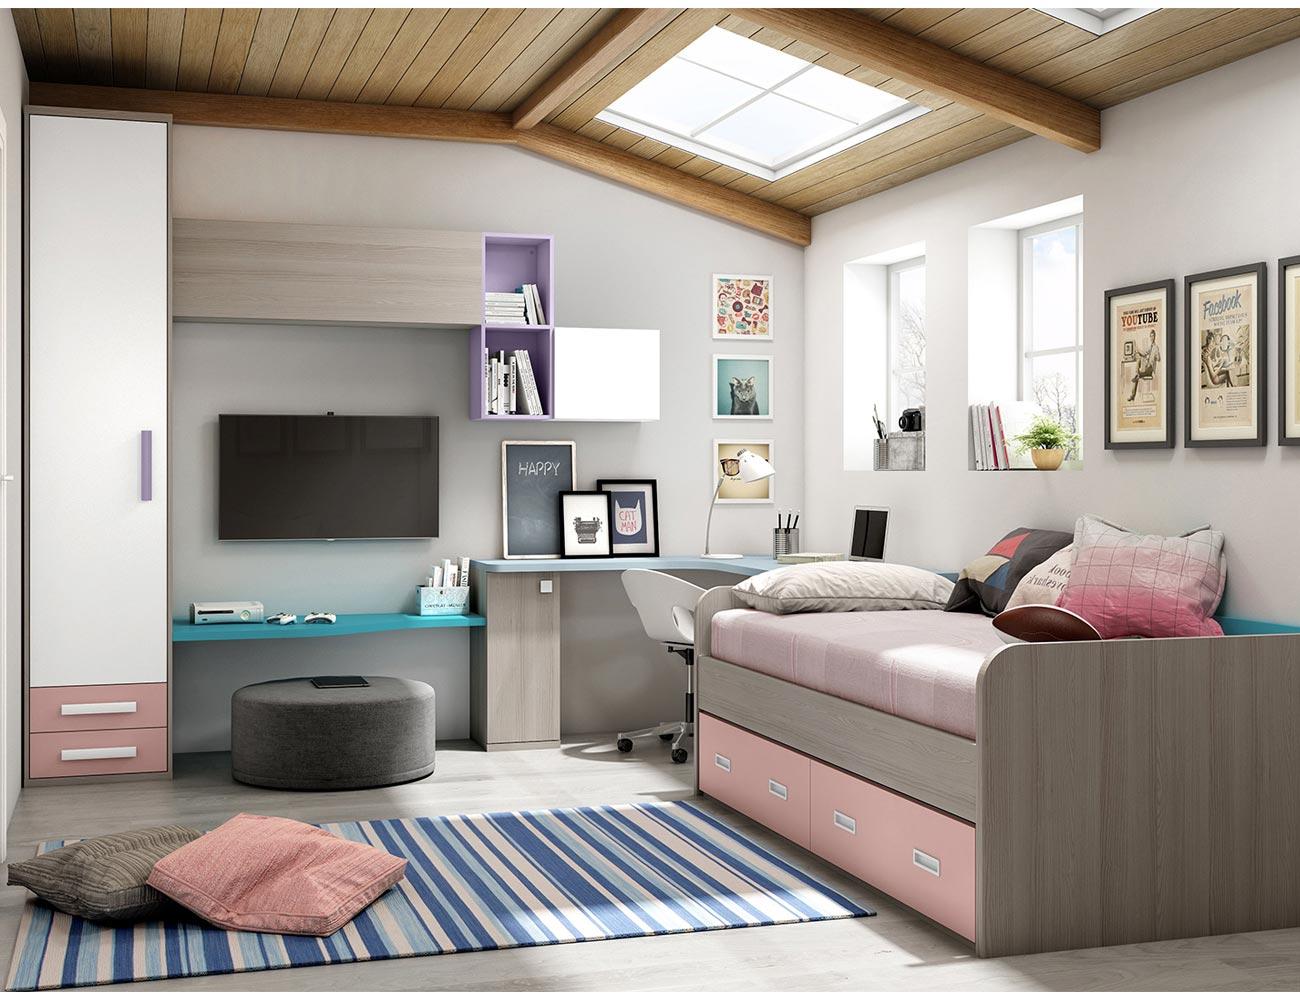 Muebles dormitorio juvenil moderno 20170723215141 - Muebles dormitorios juveniles modernos ...